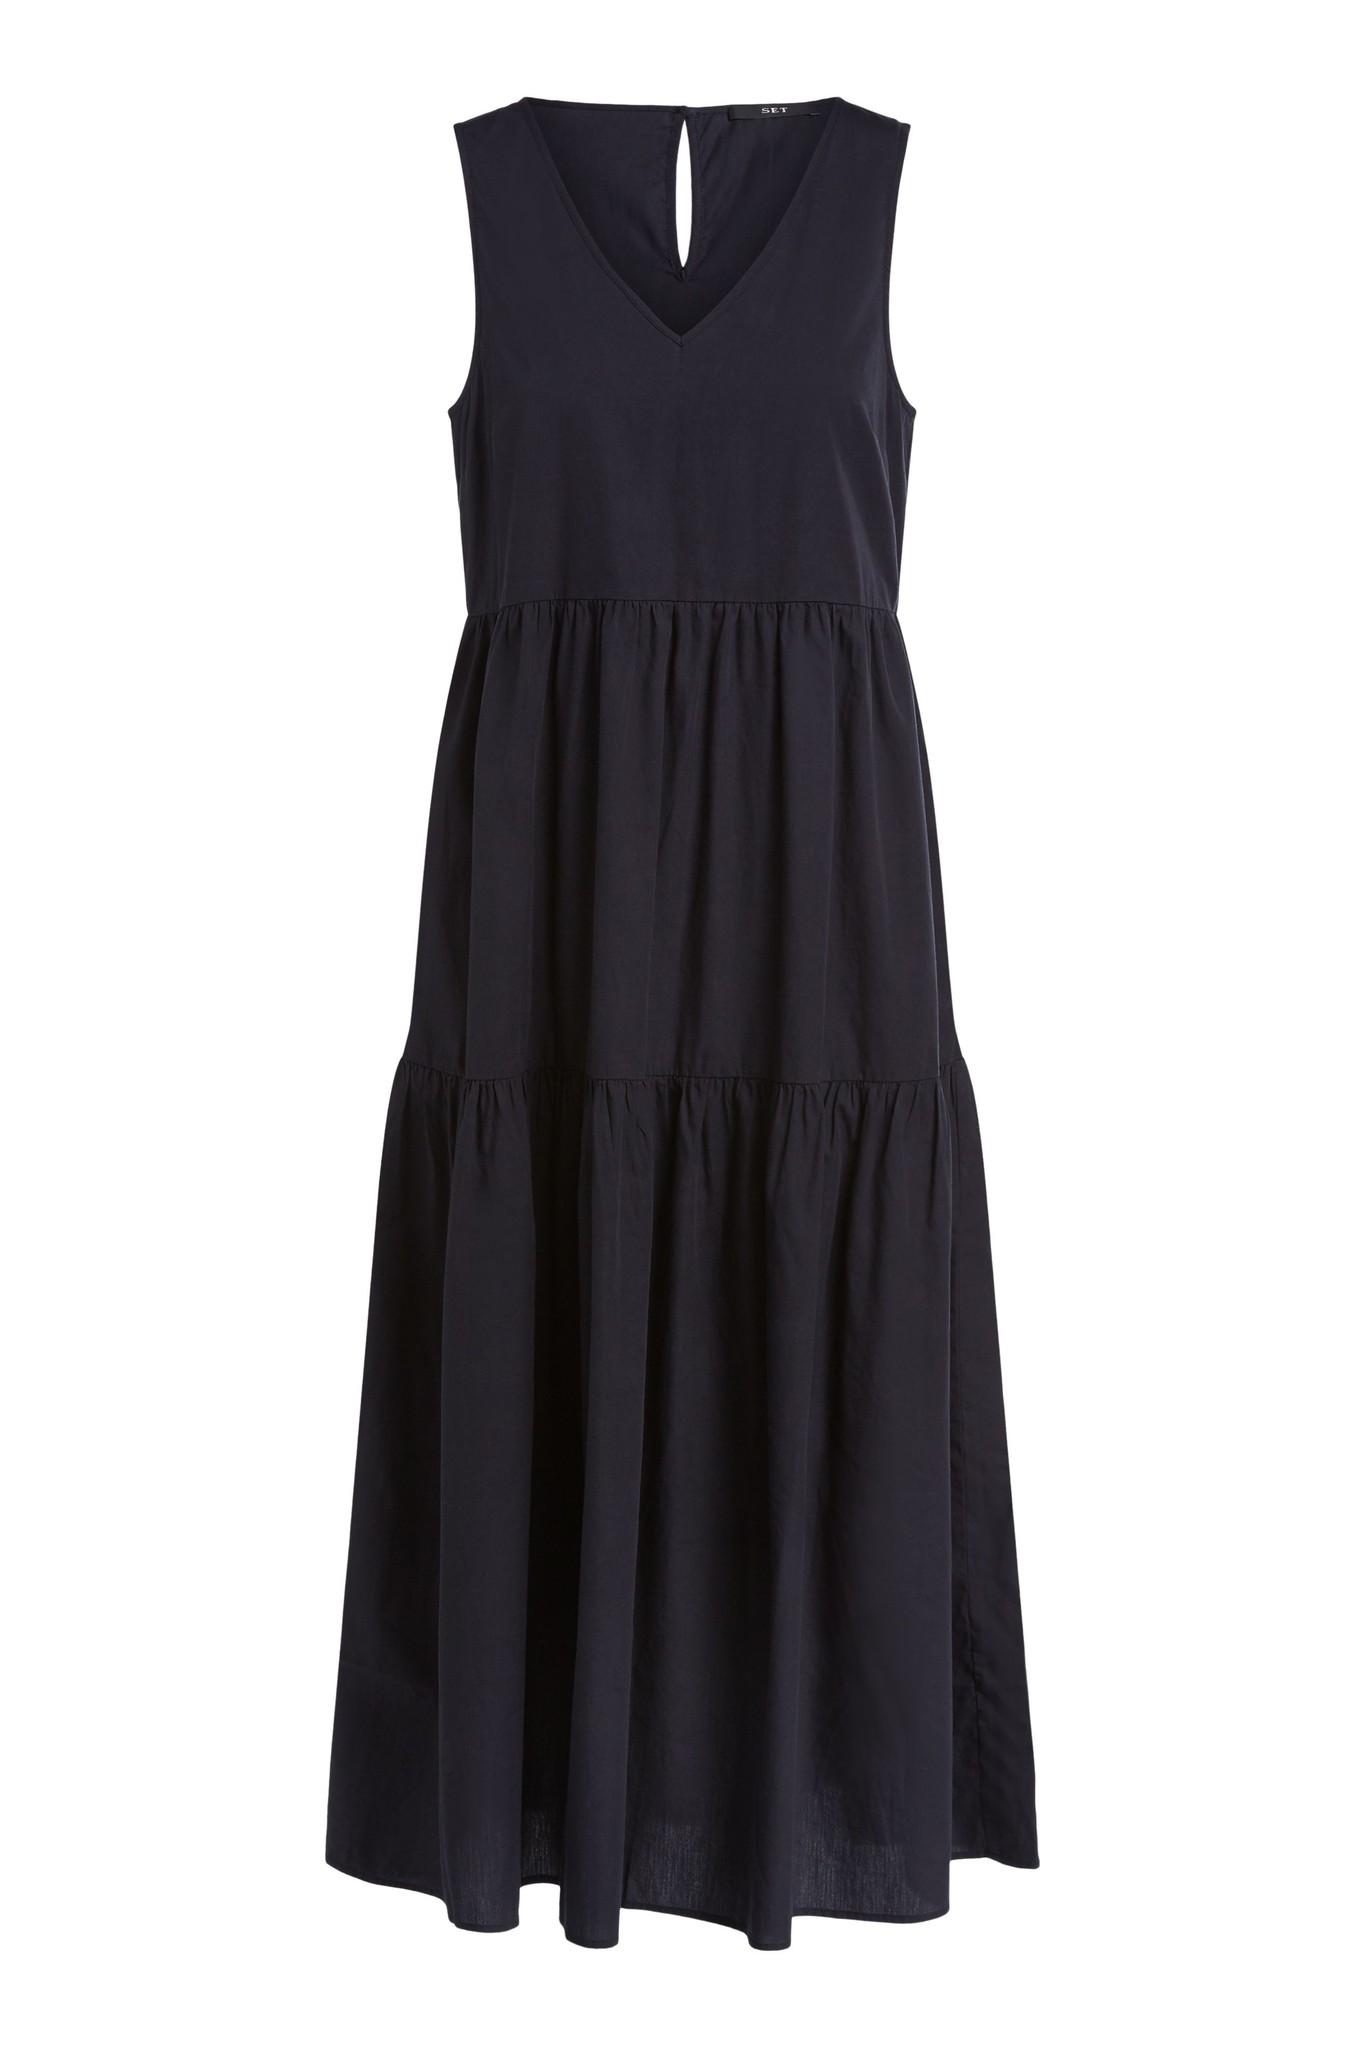 SET dress 721905110403-3